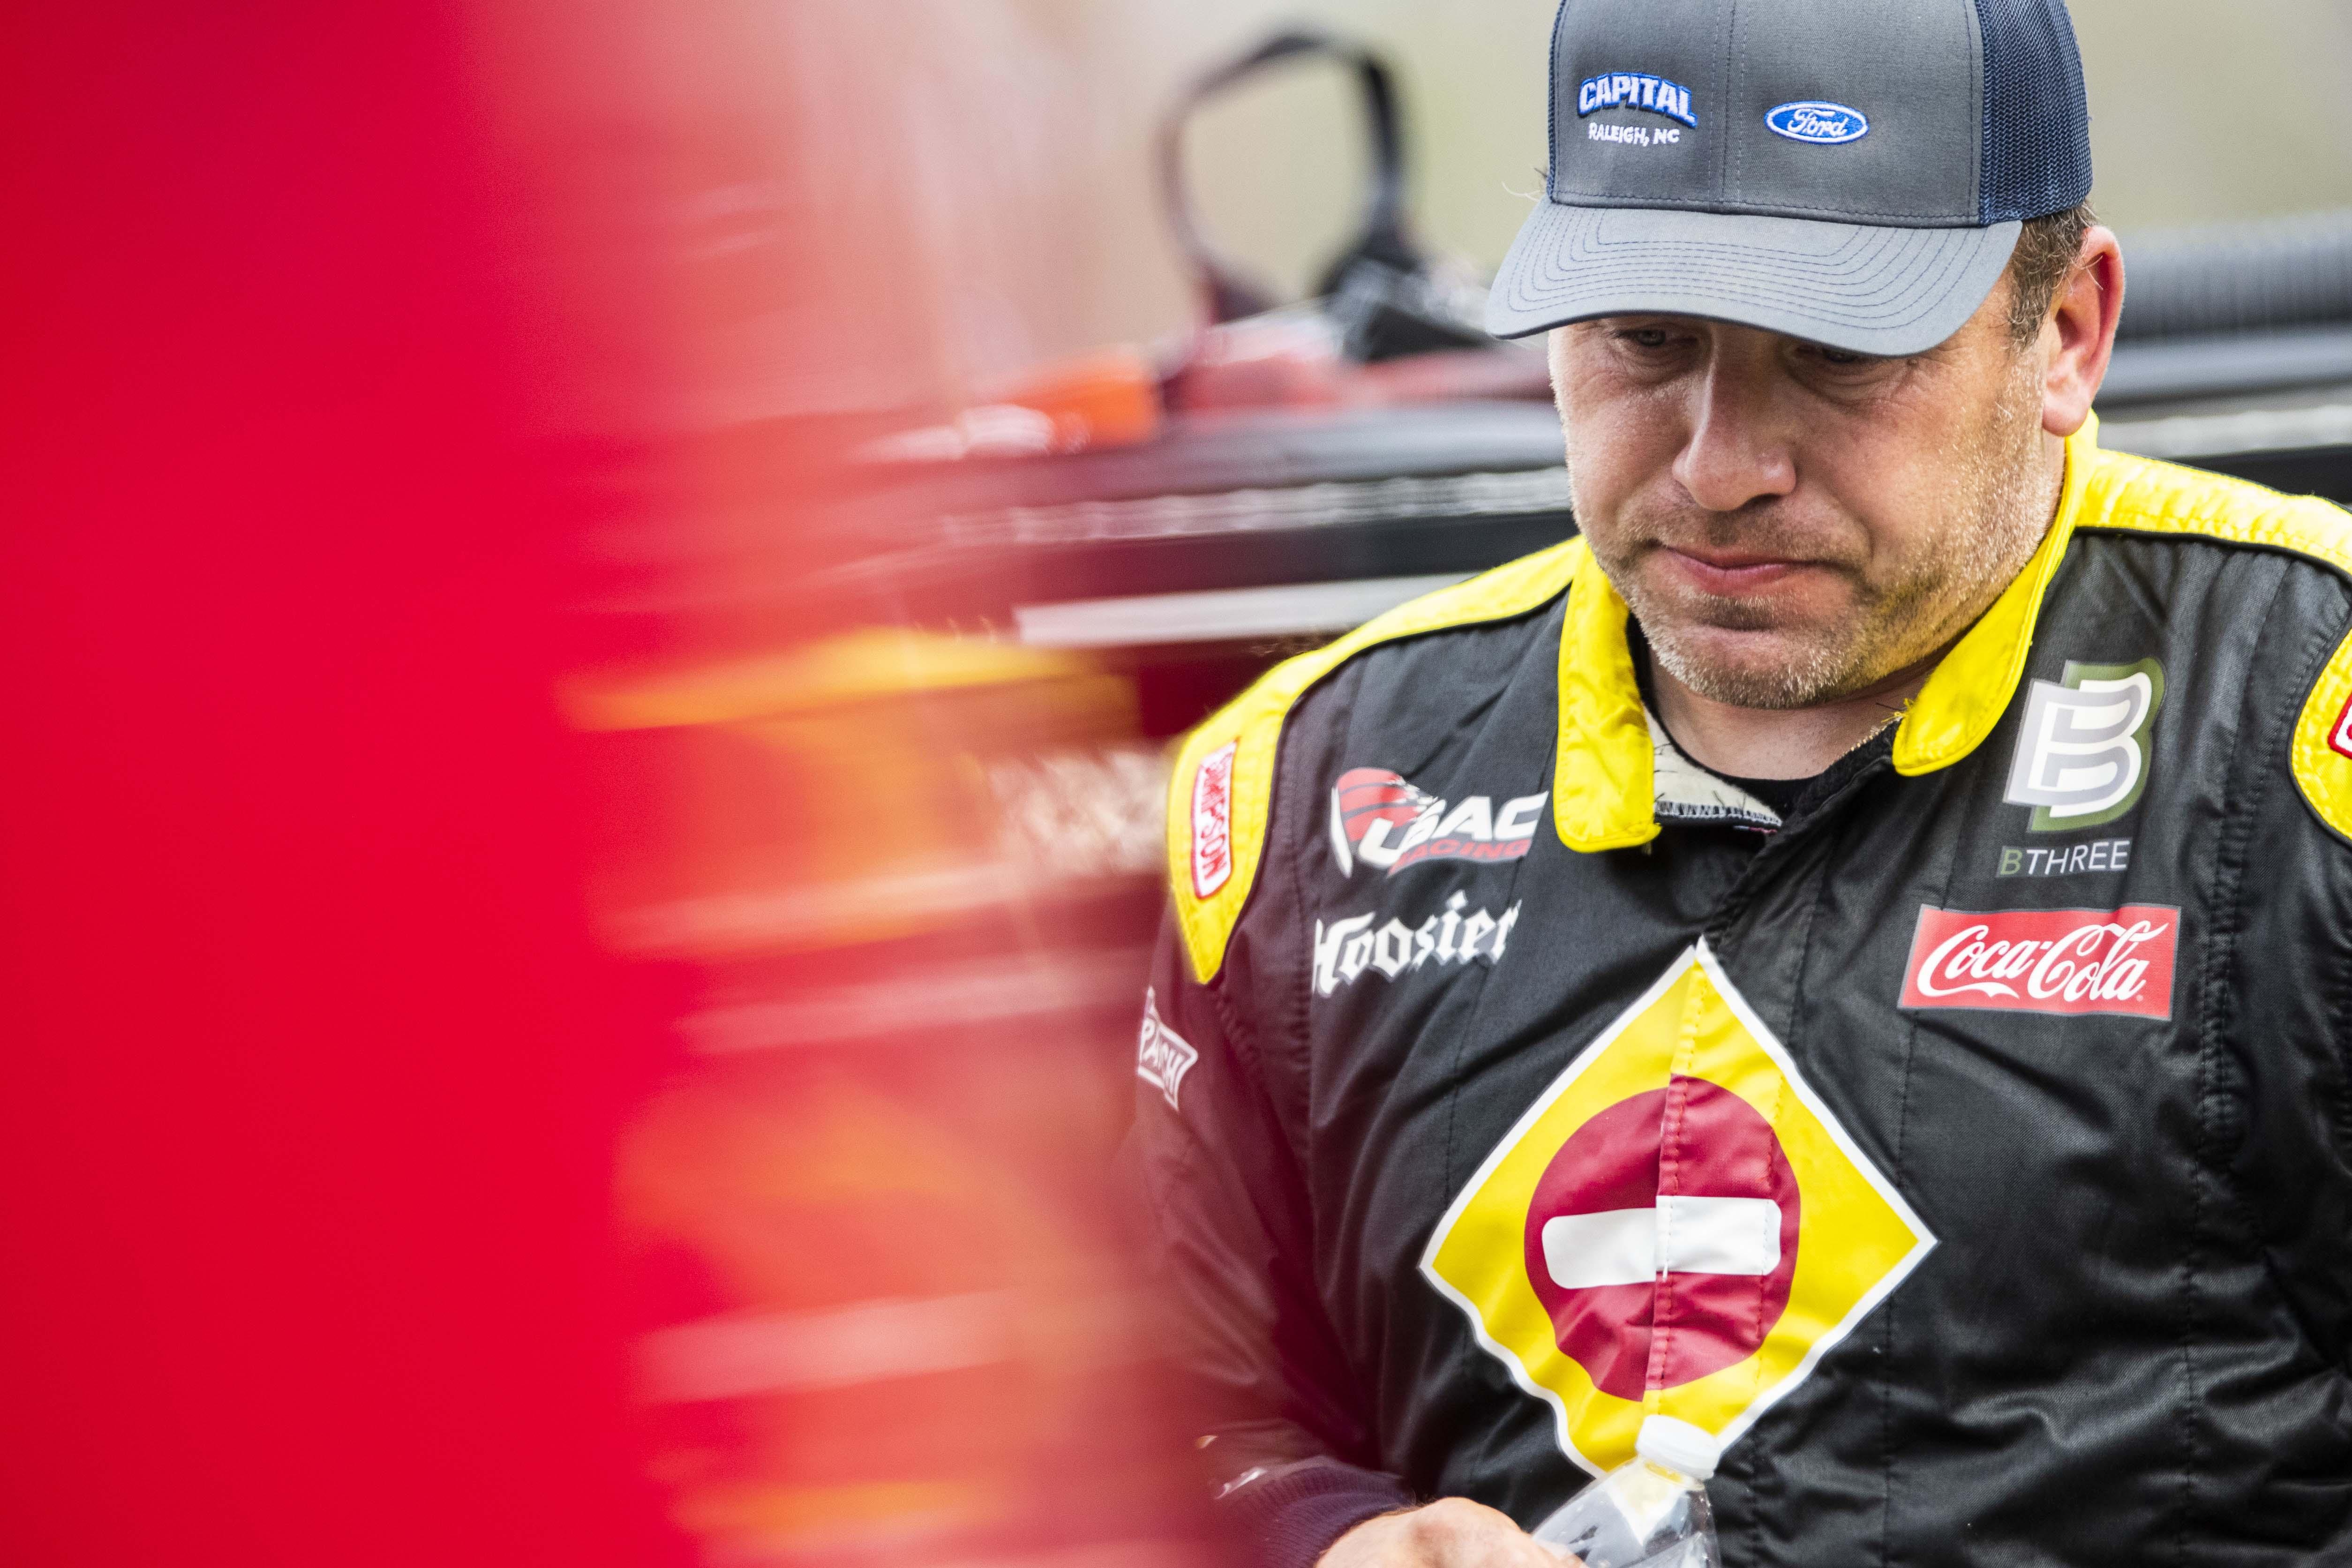 Ryan Newman - NASCAR driver